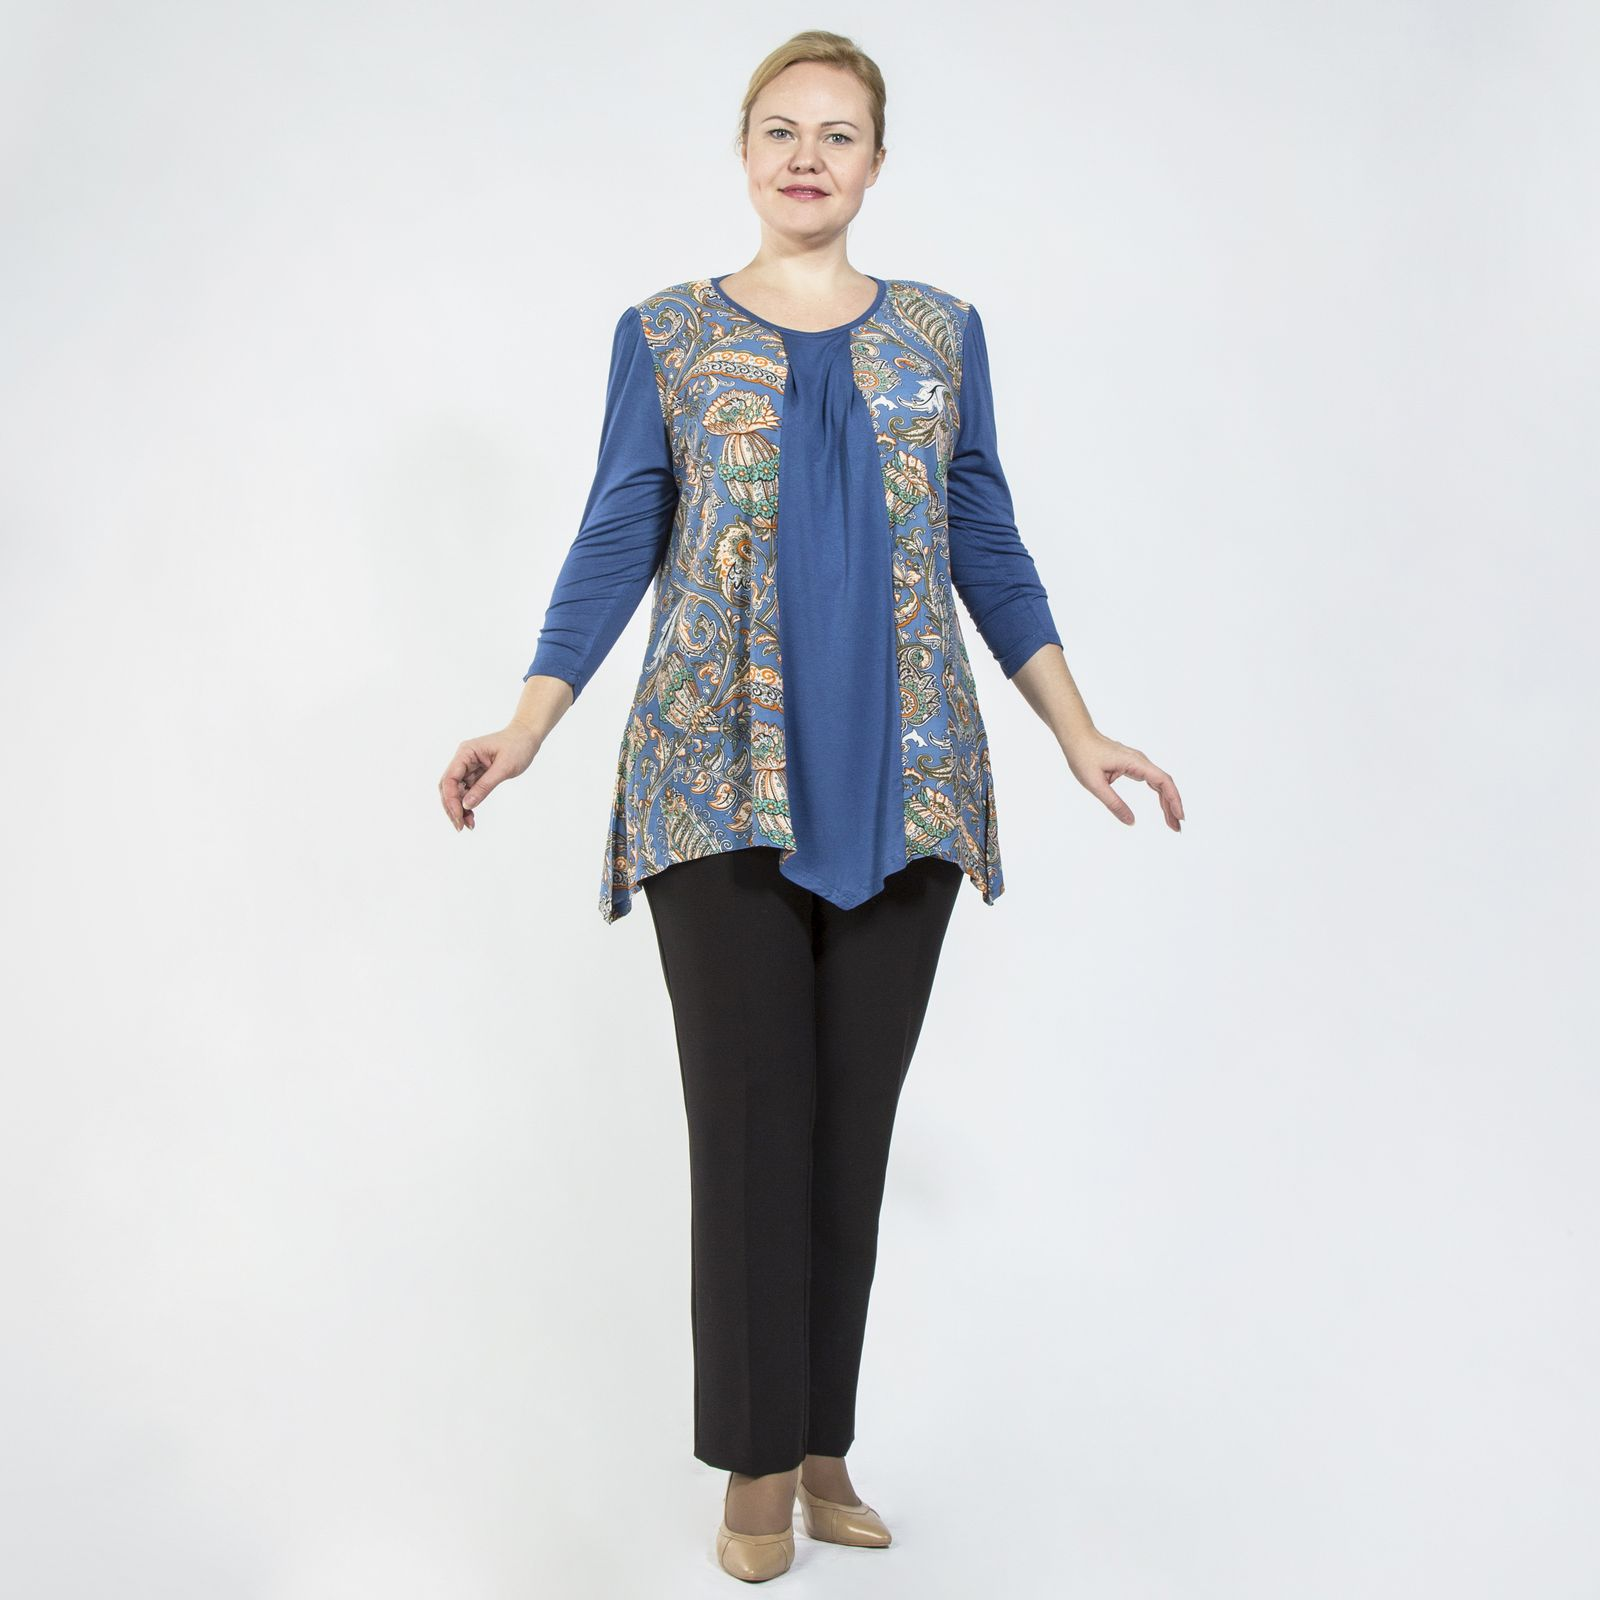 Блуза свободного кроя со сборками на рукавах